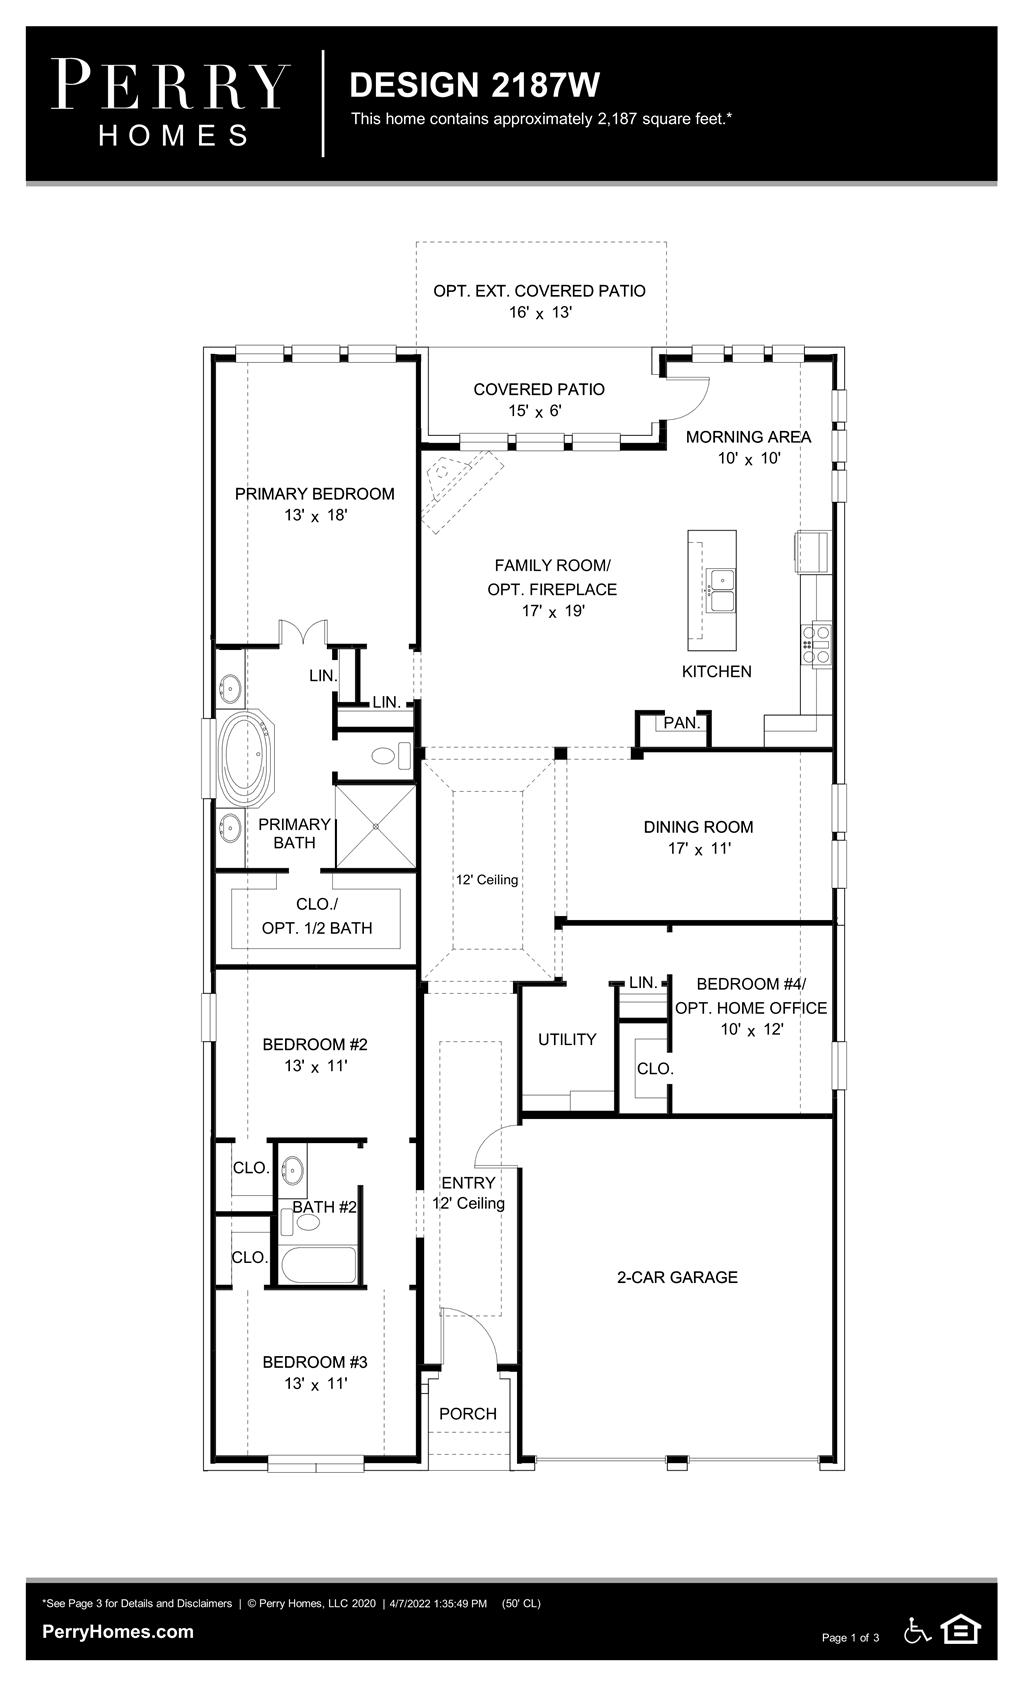 Floor Plan for 2187W